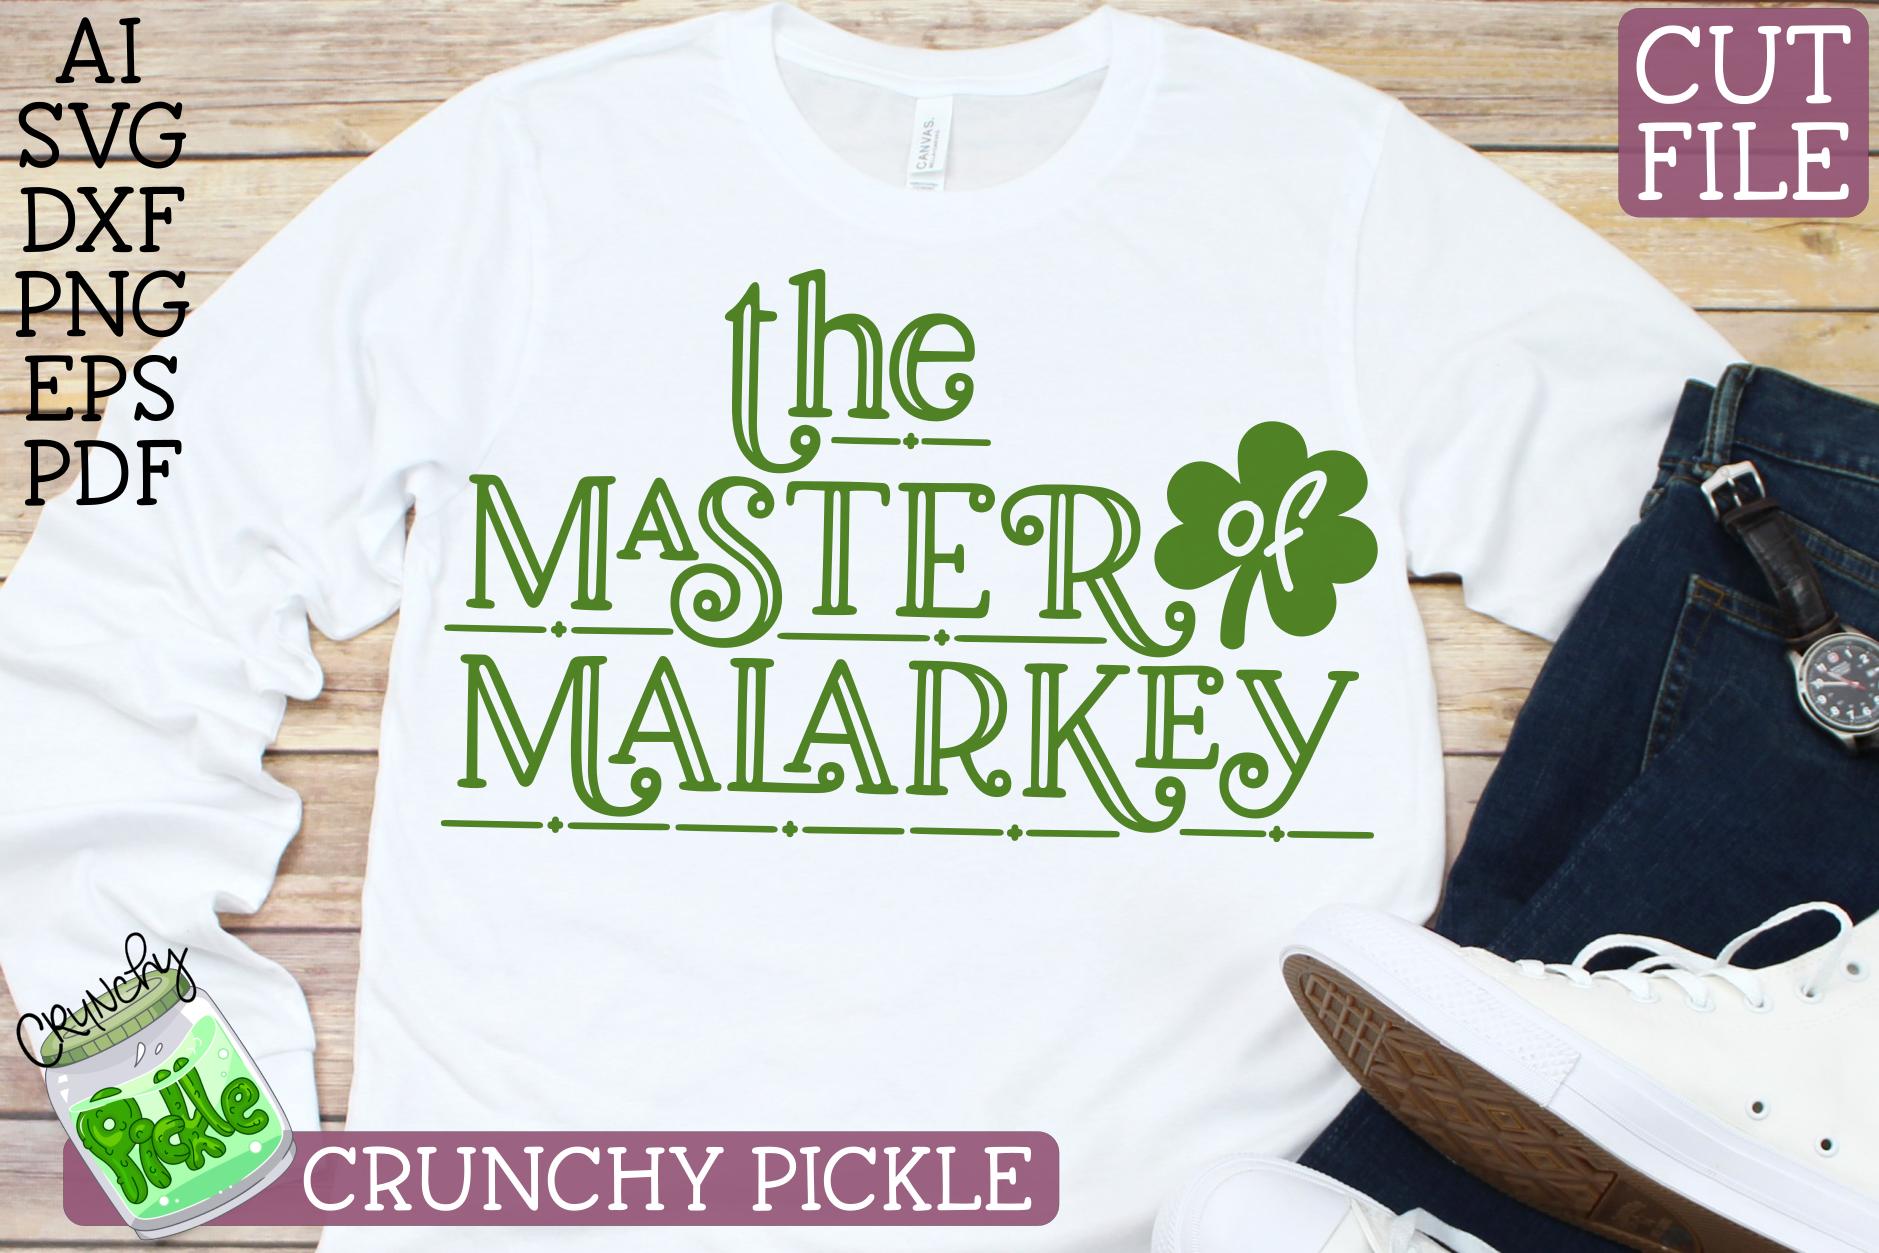 Master of Malarkey St. Patrick's Day SVG File example image 3